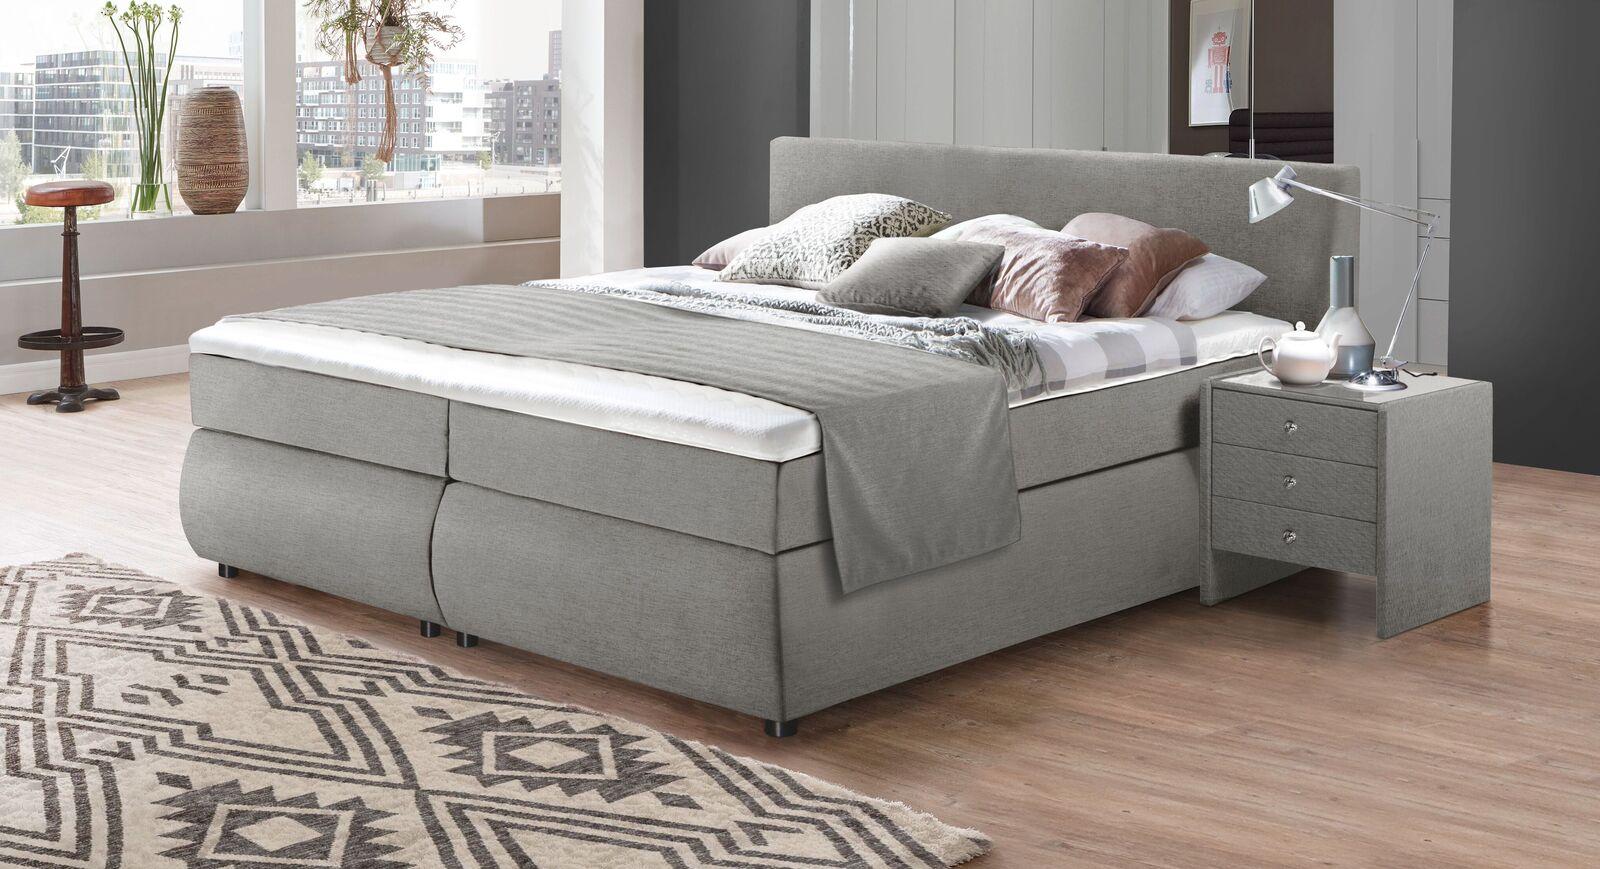 Bettkasten-Boxspringbett Highgate mit Webstoffbezug in Grau